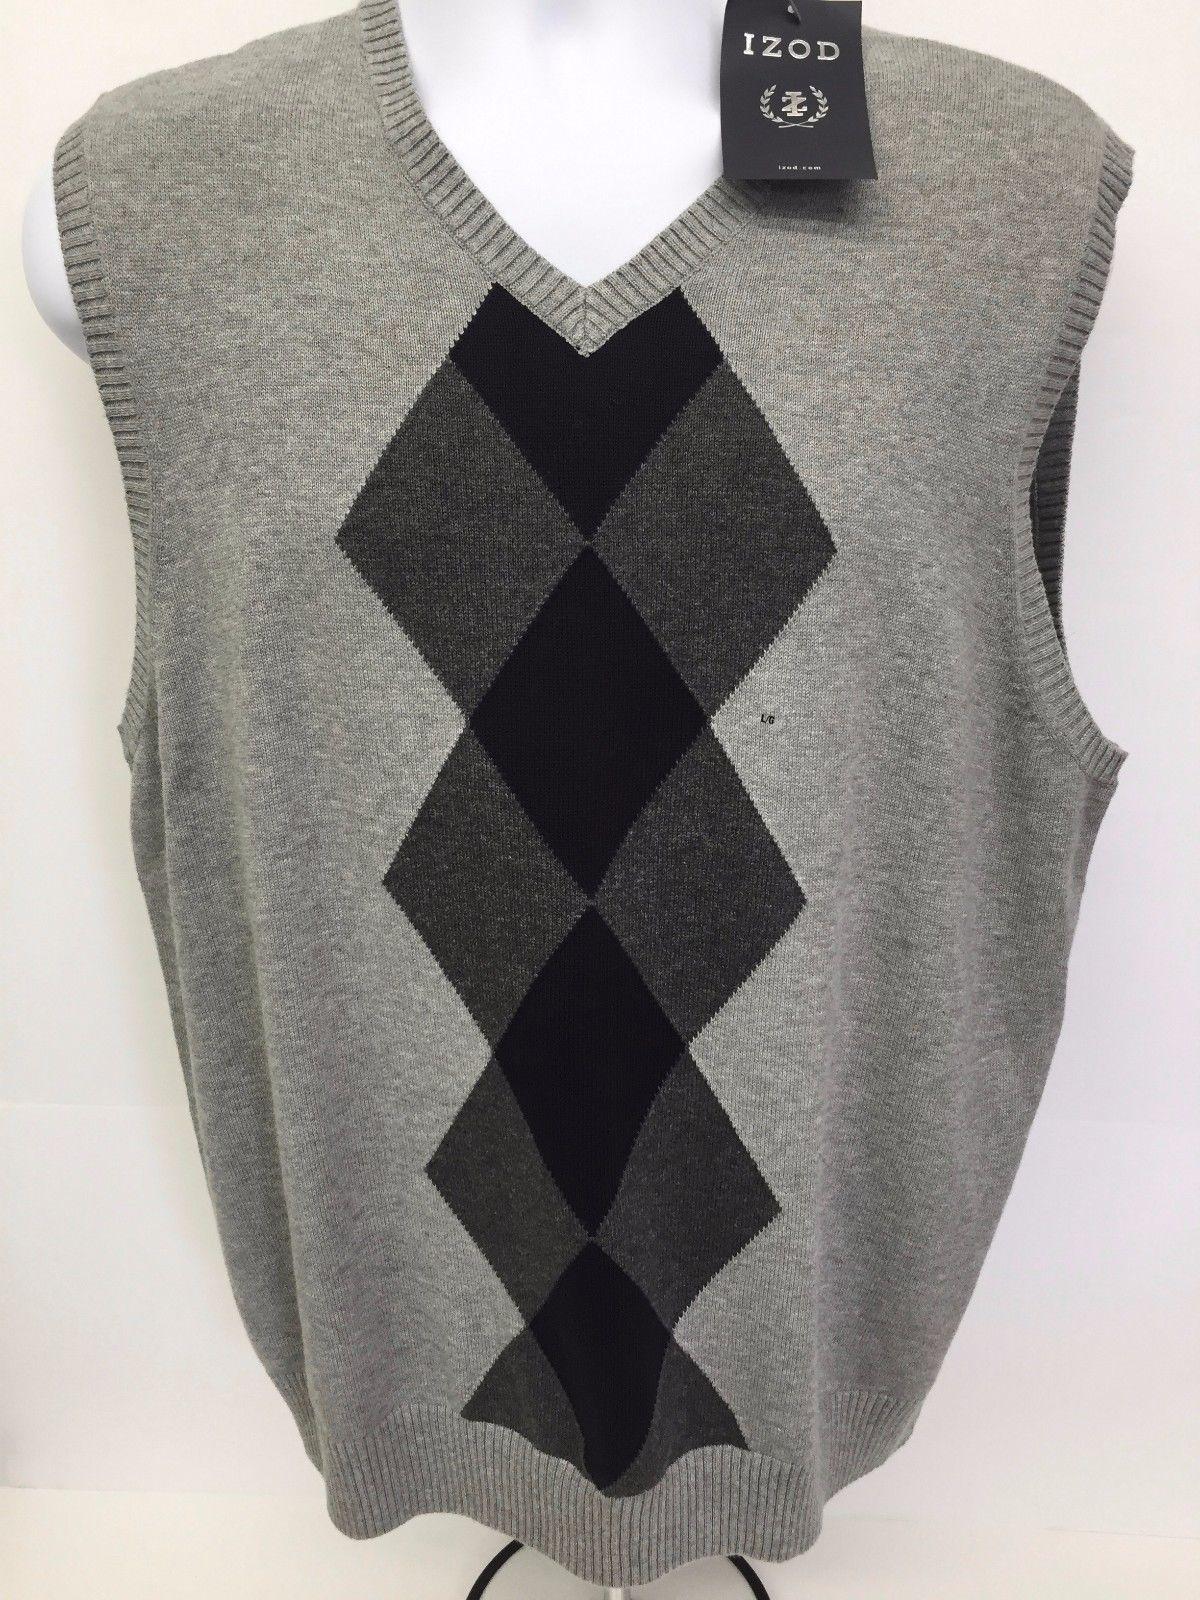 Mens IZOD Cotton Argyle Pullover Sweater Vest Gray V-Neck ...